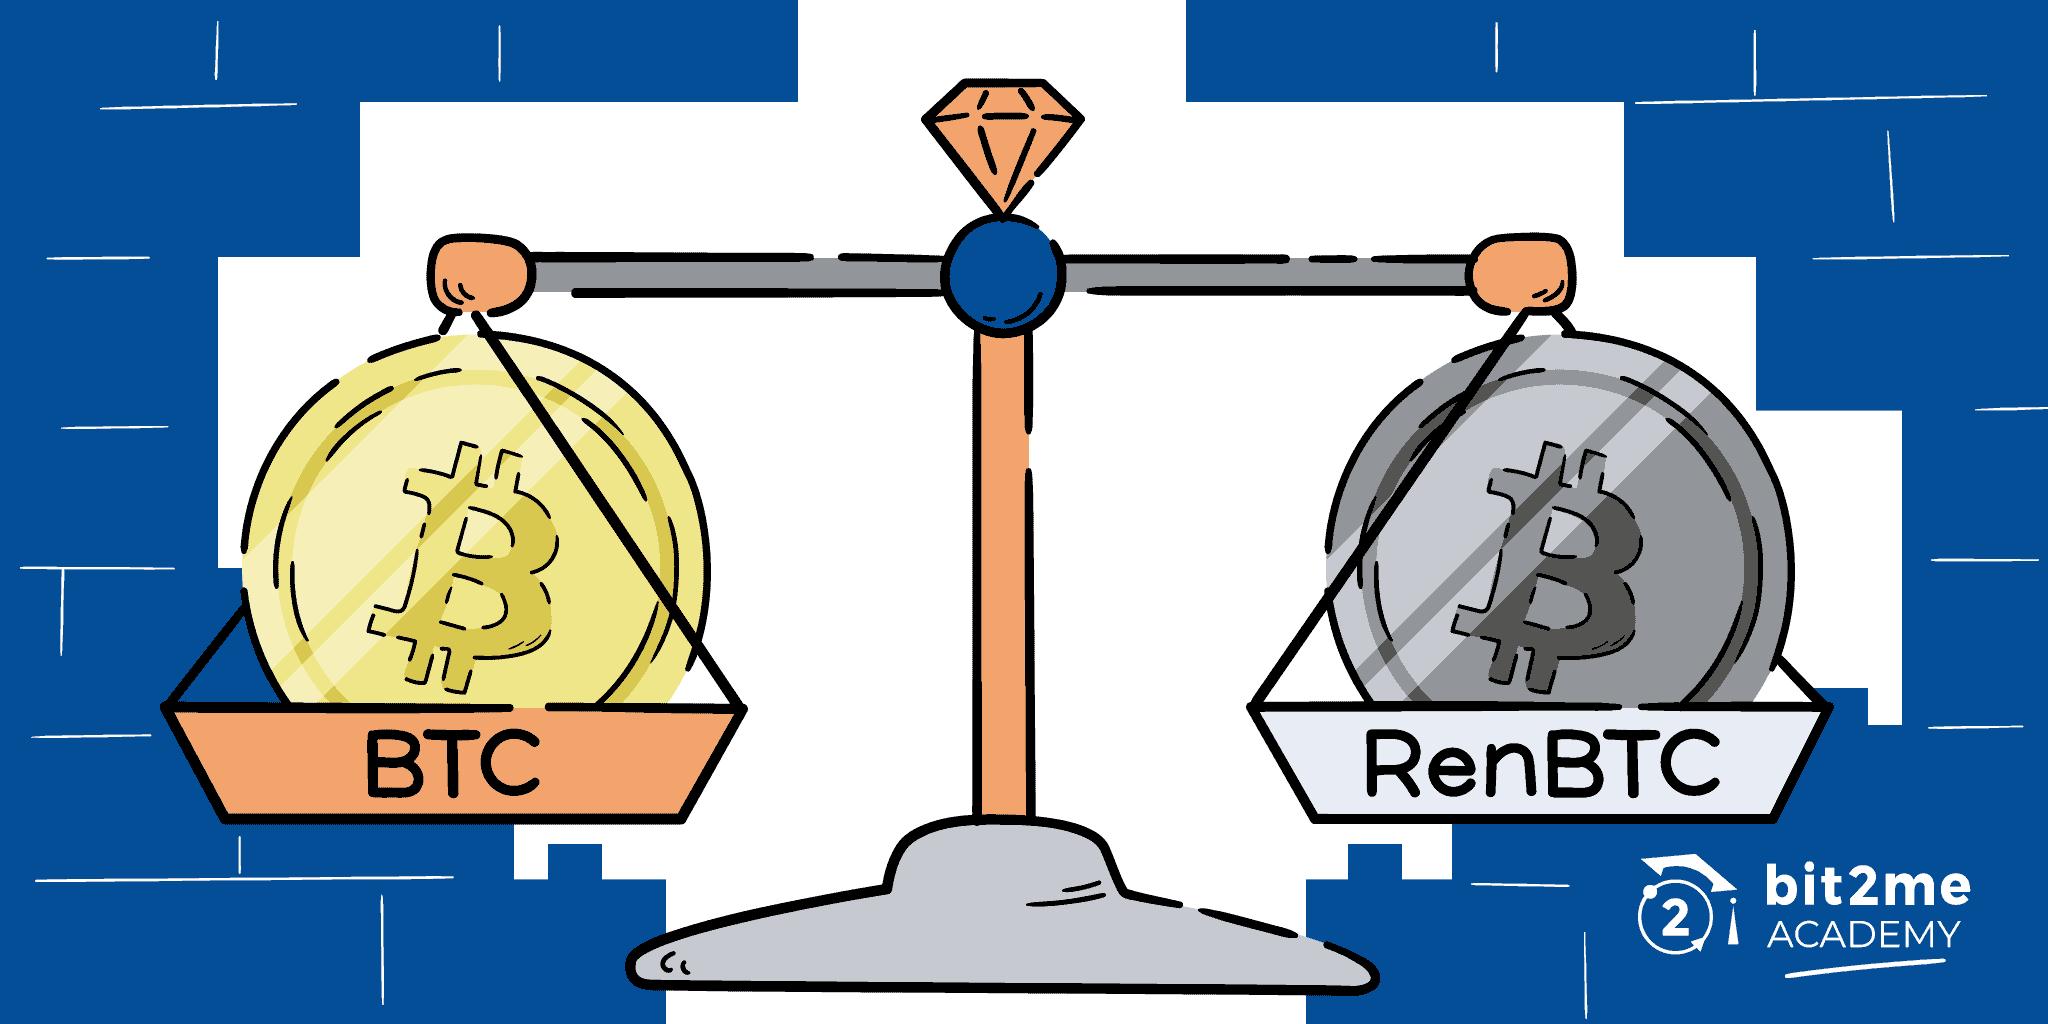 renbtc defi